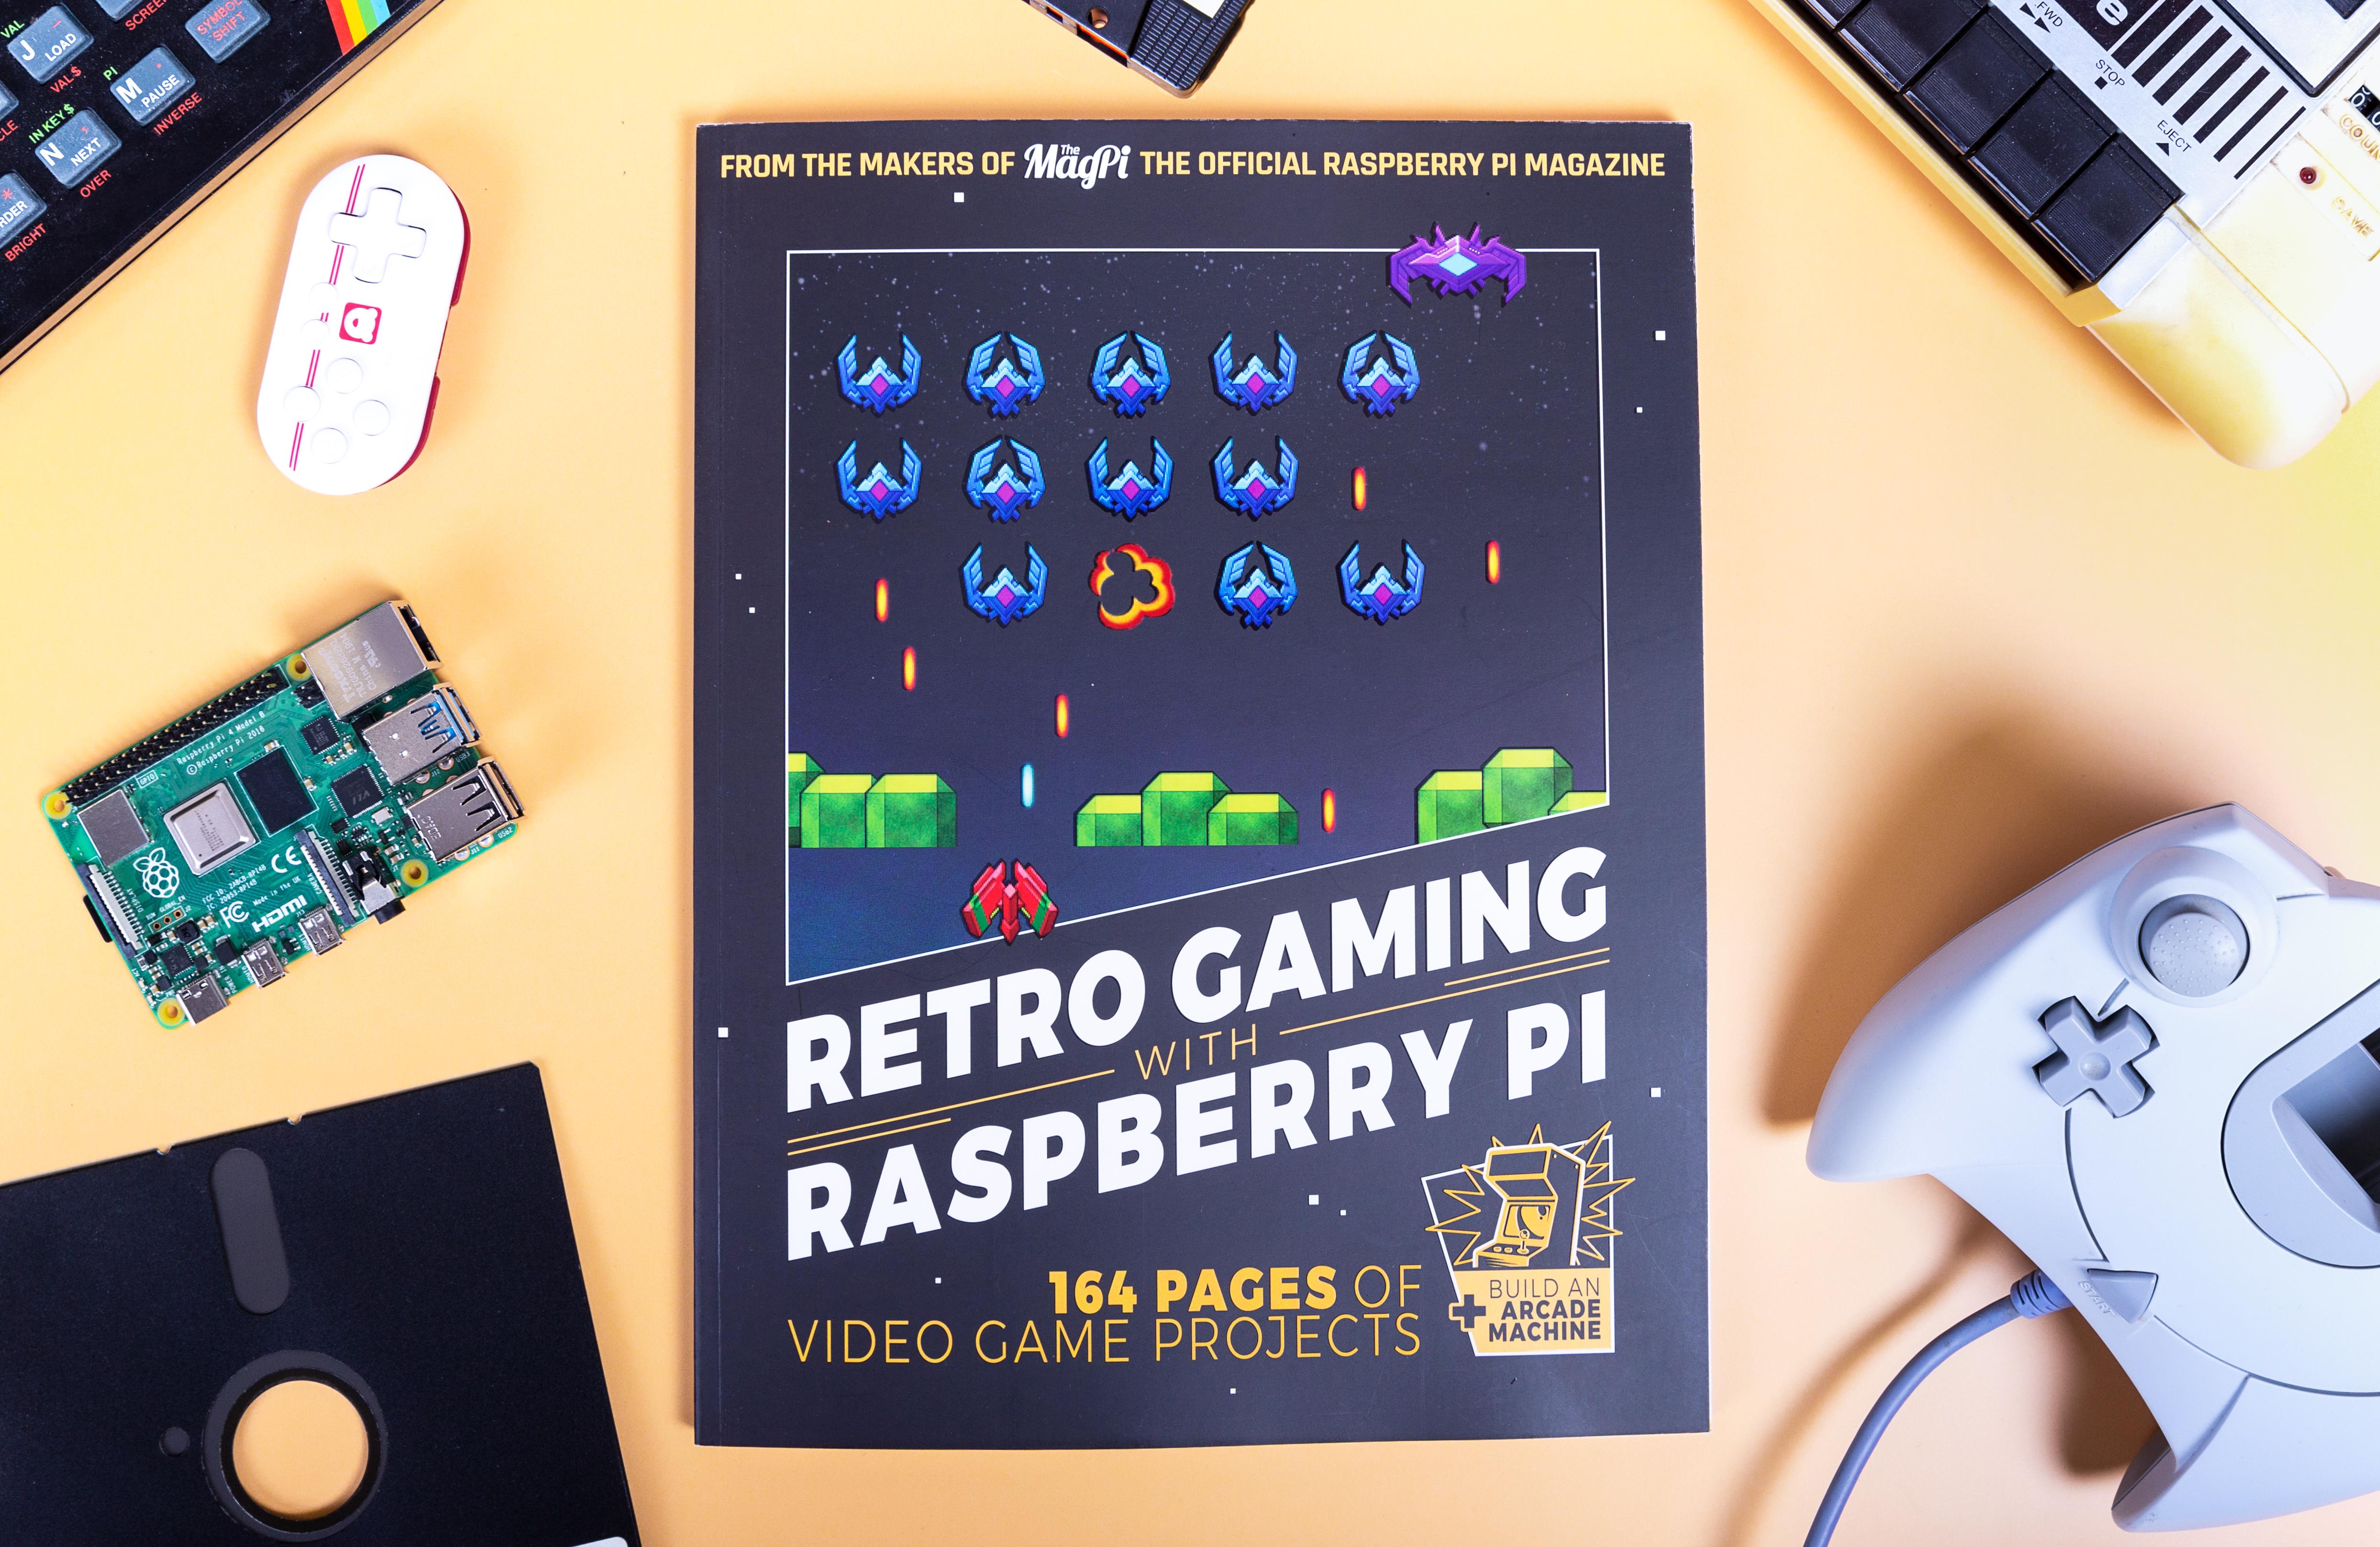 New book: Retro Gaming with Raspberry Pi - Raspberry Pi